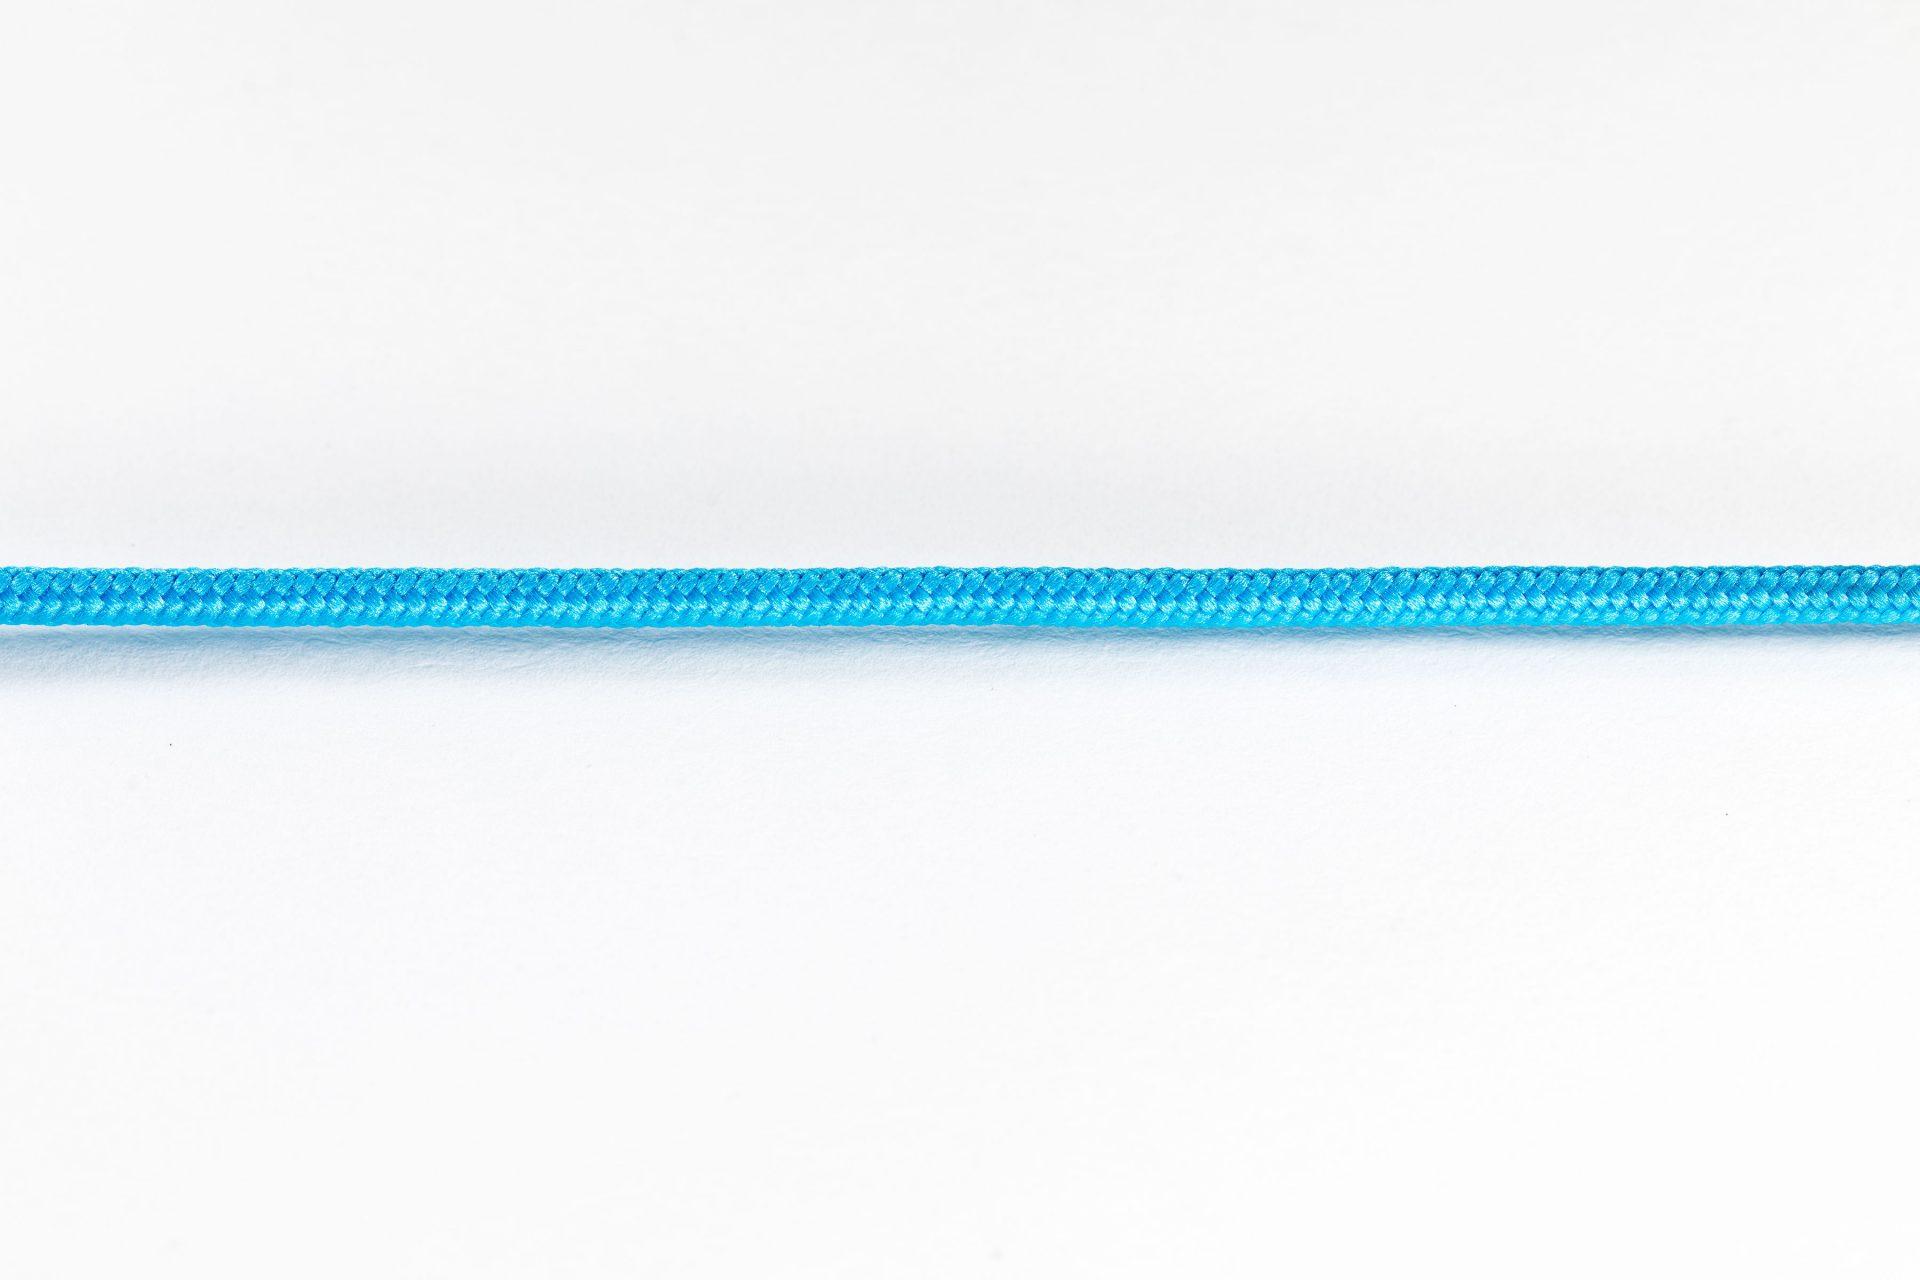 BHN25N (2.5 mm Nylon Cord)